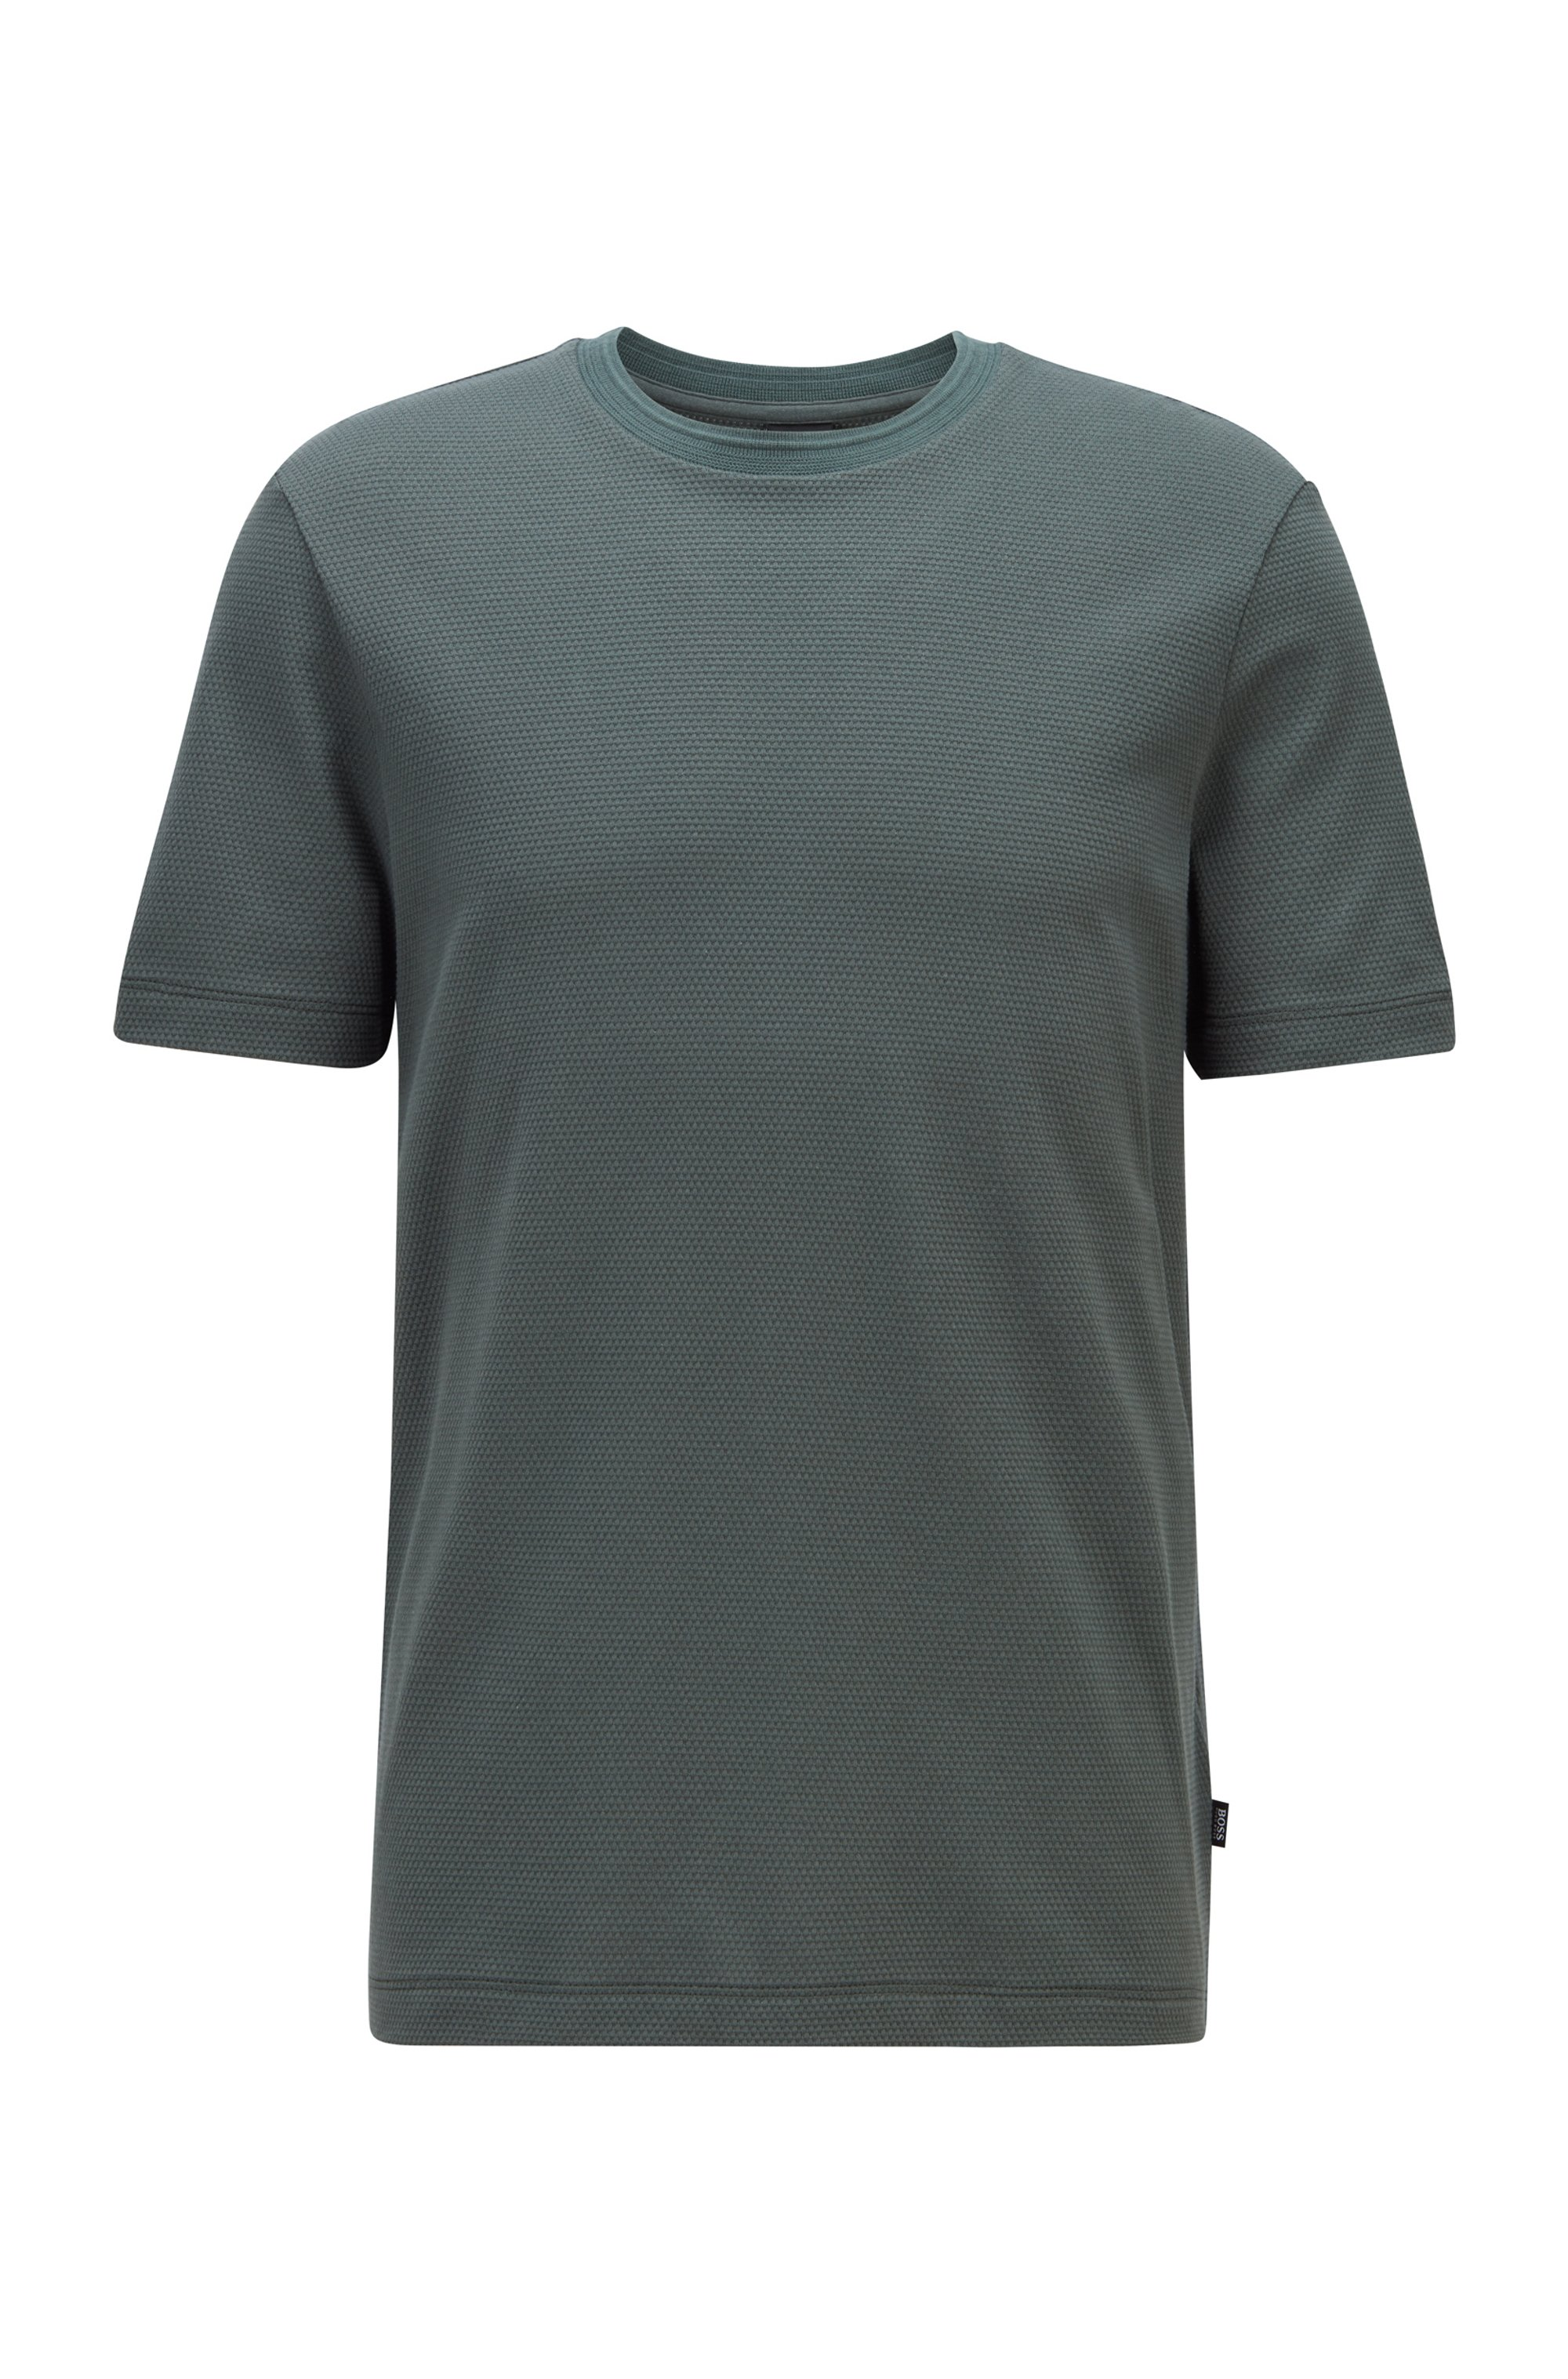 Camiseta en mezcla de algodón con estructura de jacquard de burbujas, Verde oscuro